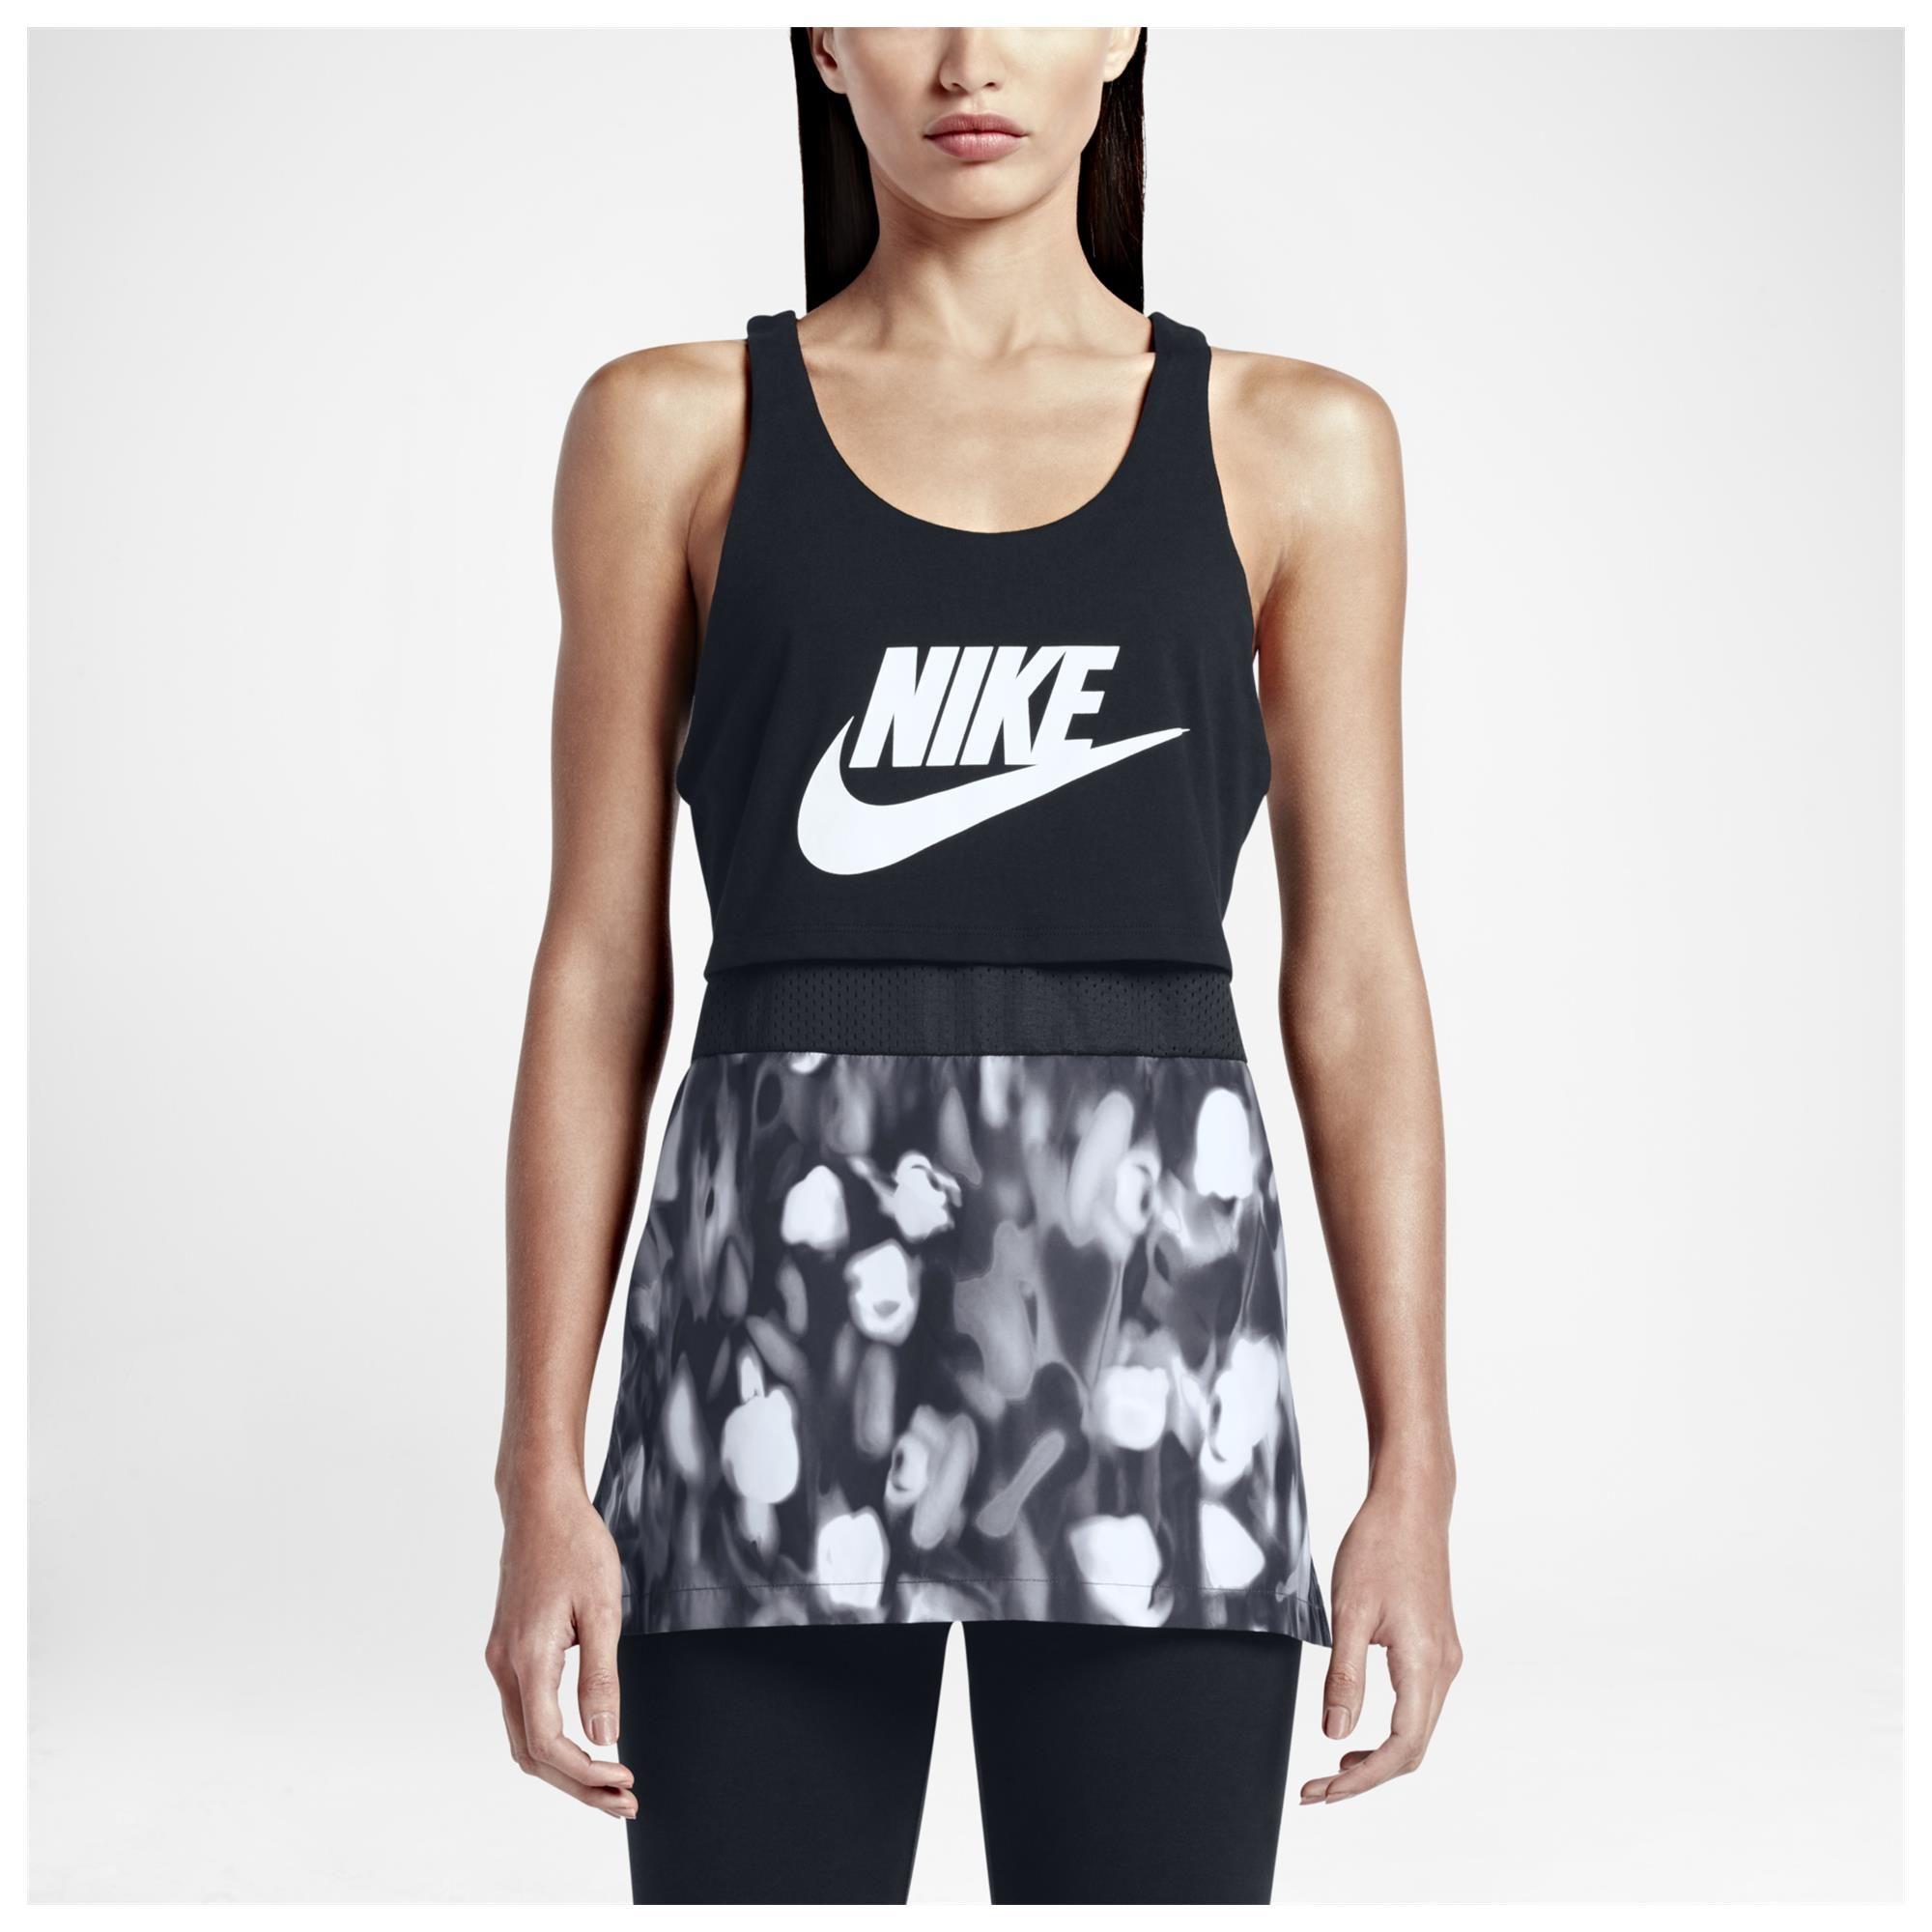 Camiseta Regata Nike AOP Graphic Feminina   Nike